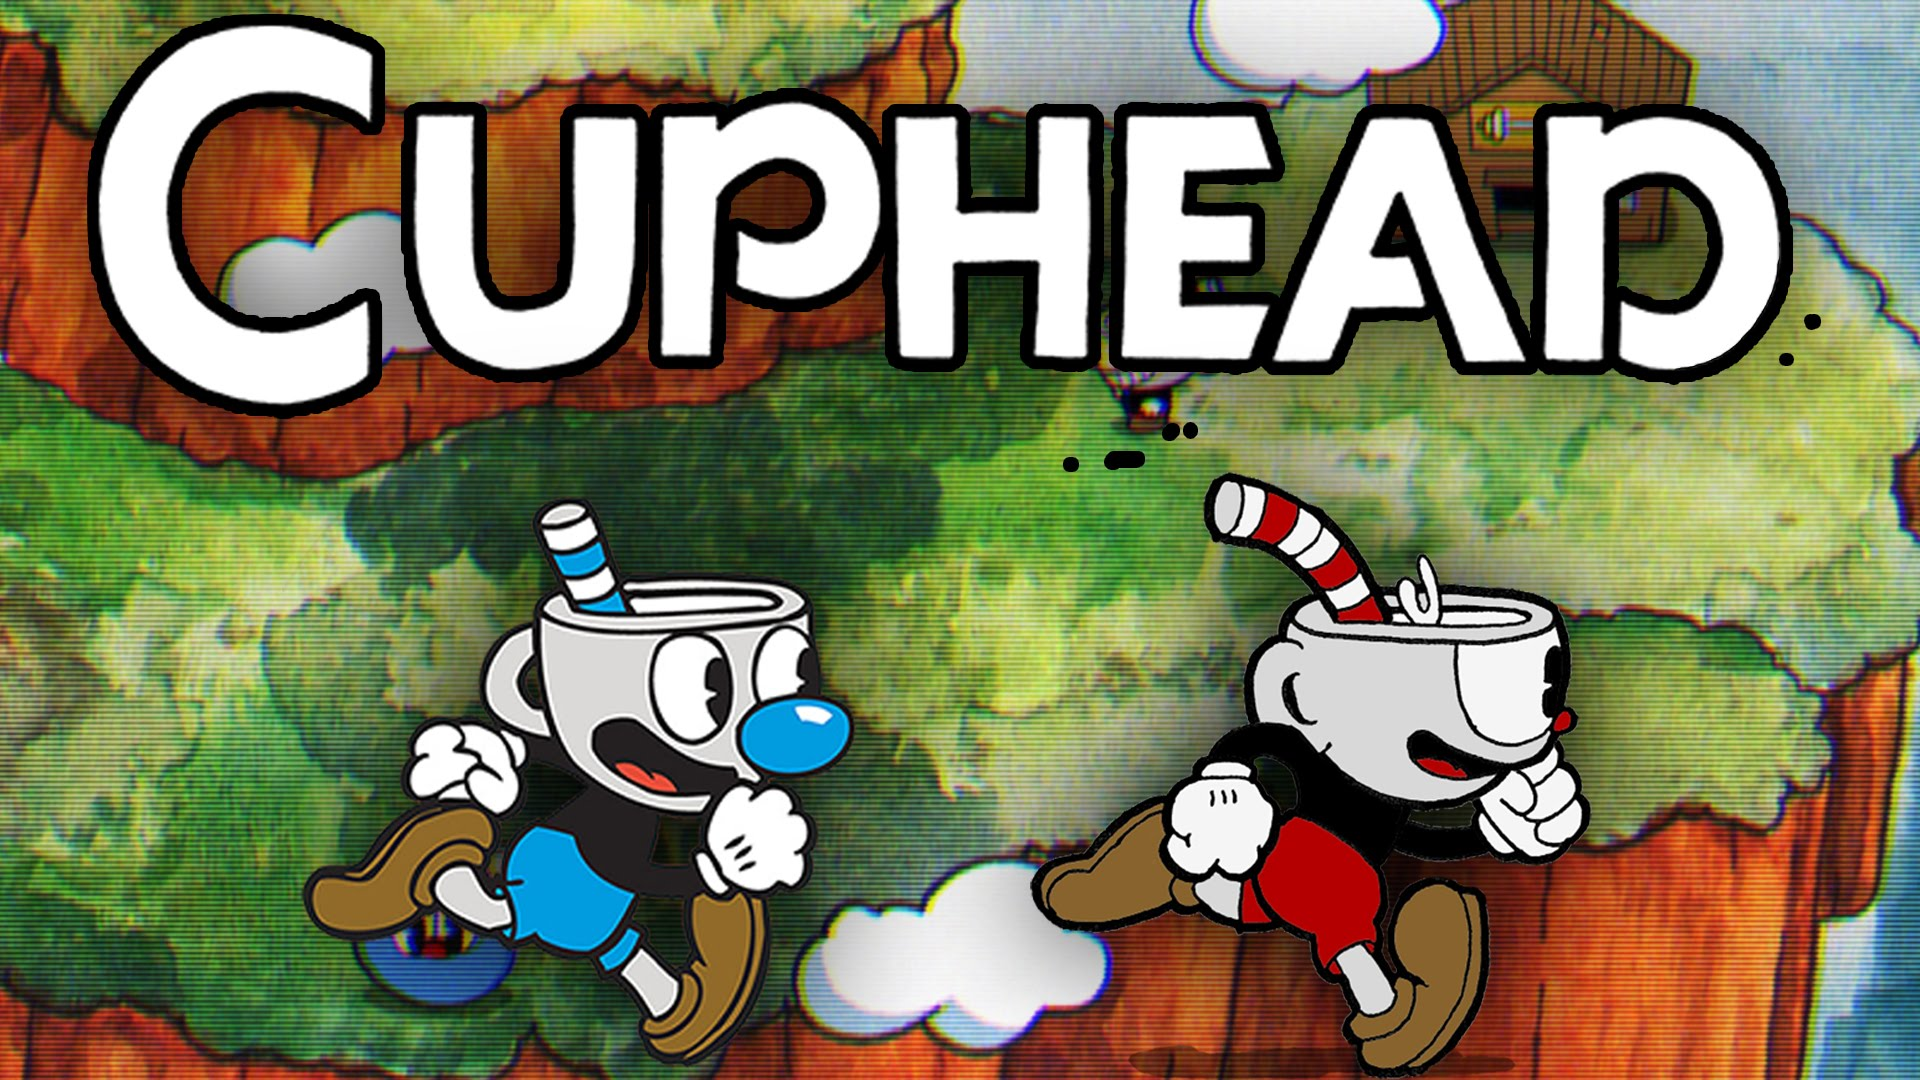 Cuphead Se Actualiza Para Corregir Diferentes Problemas